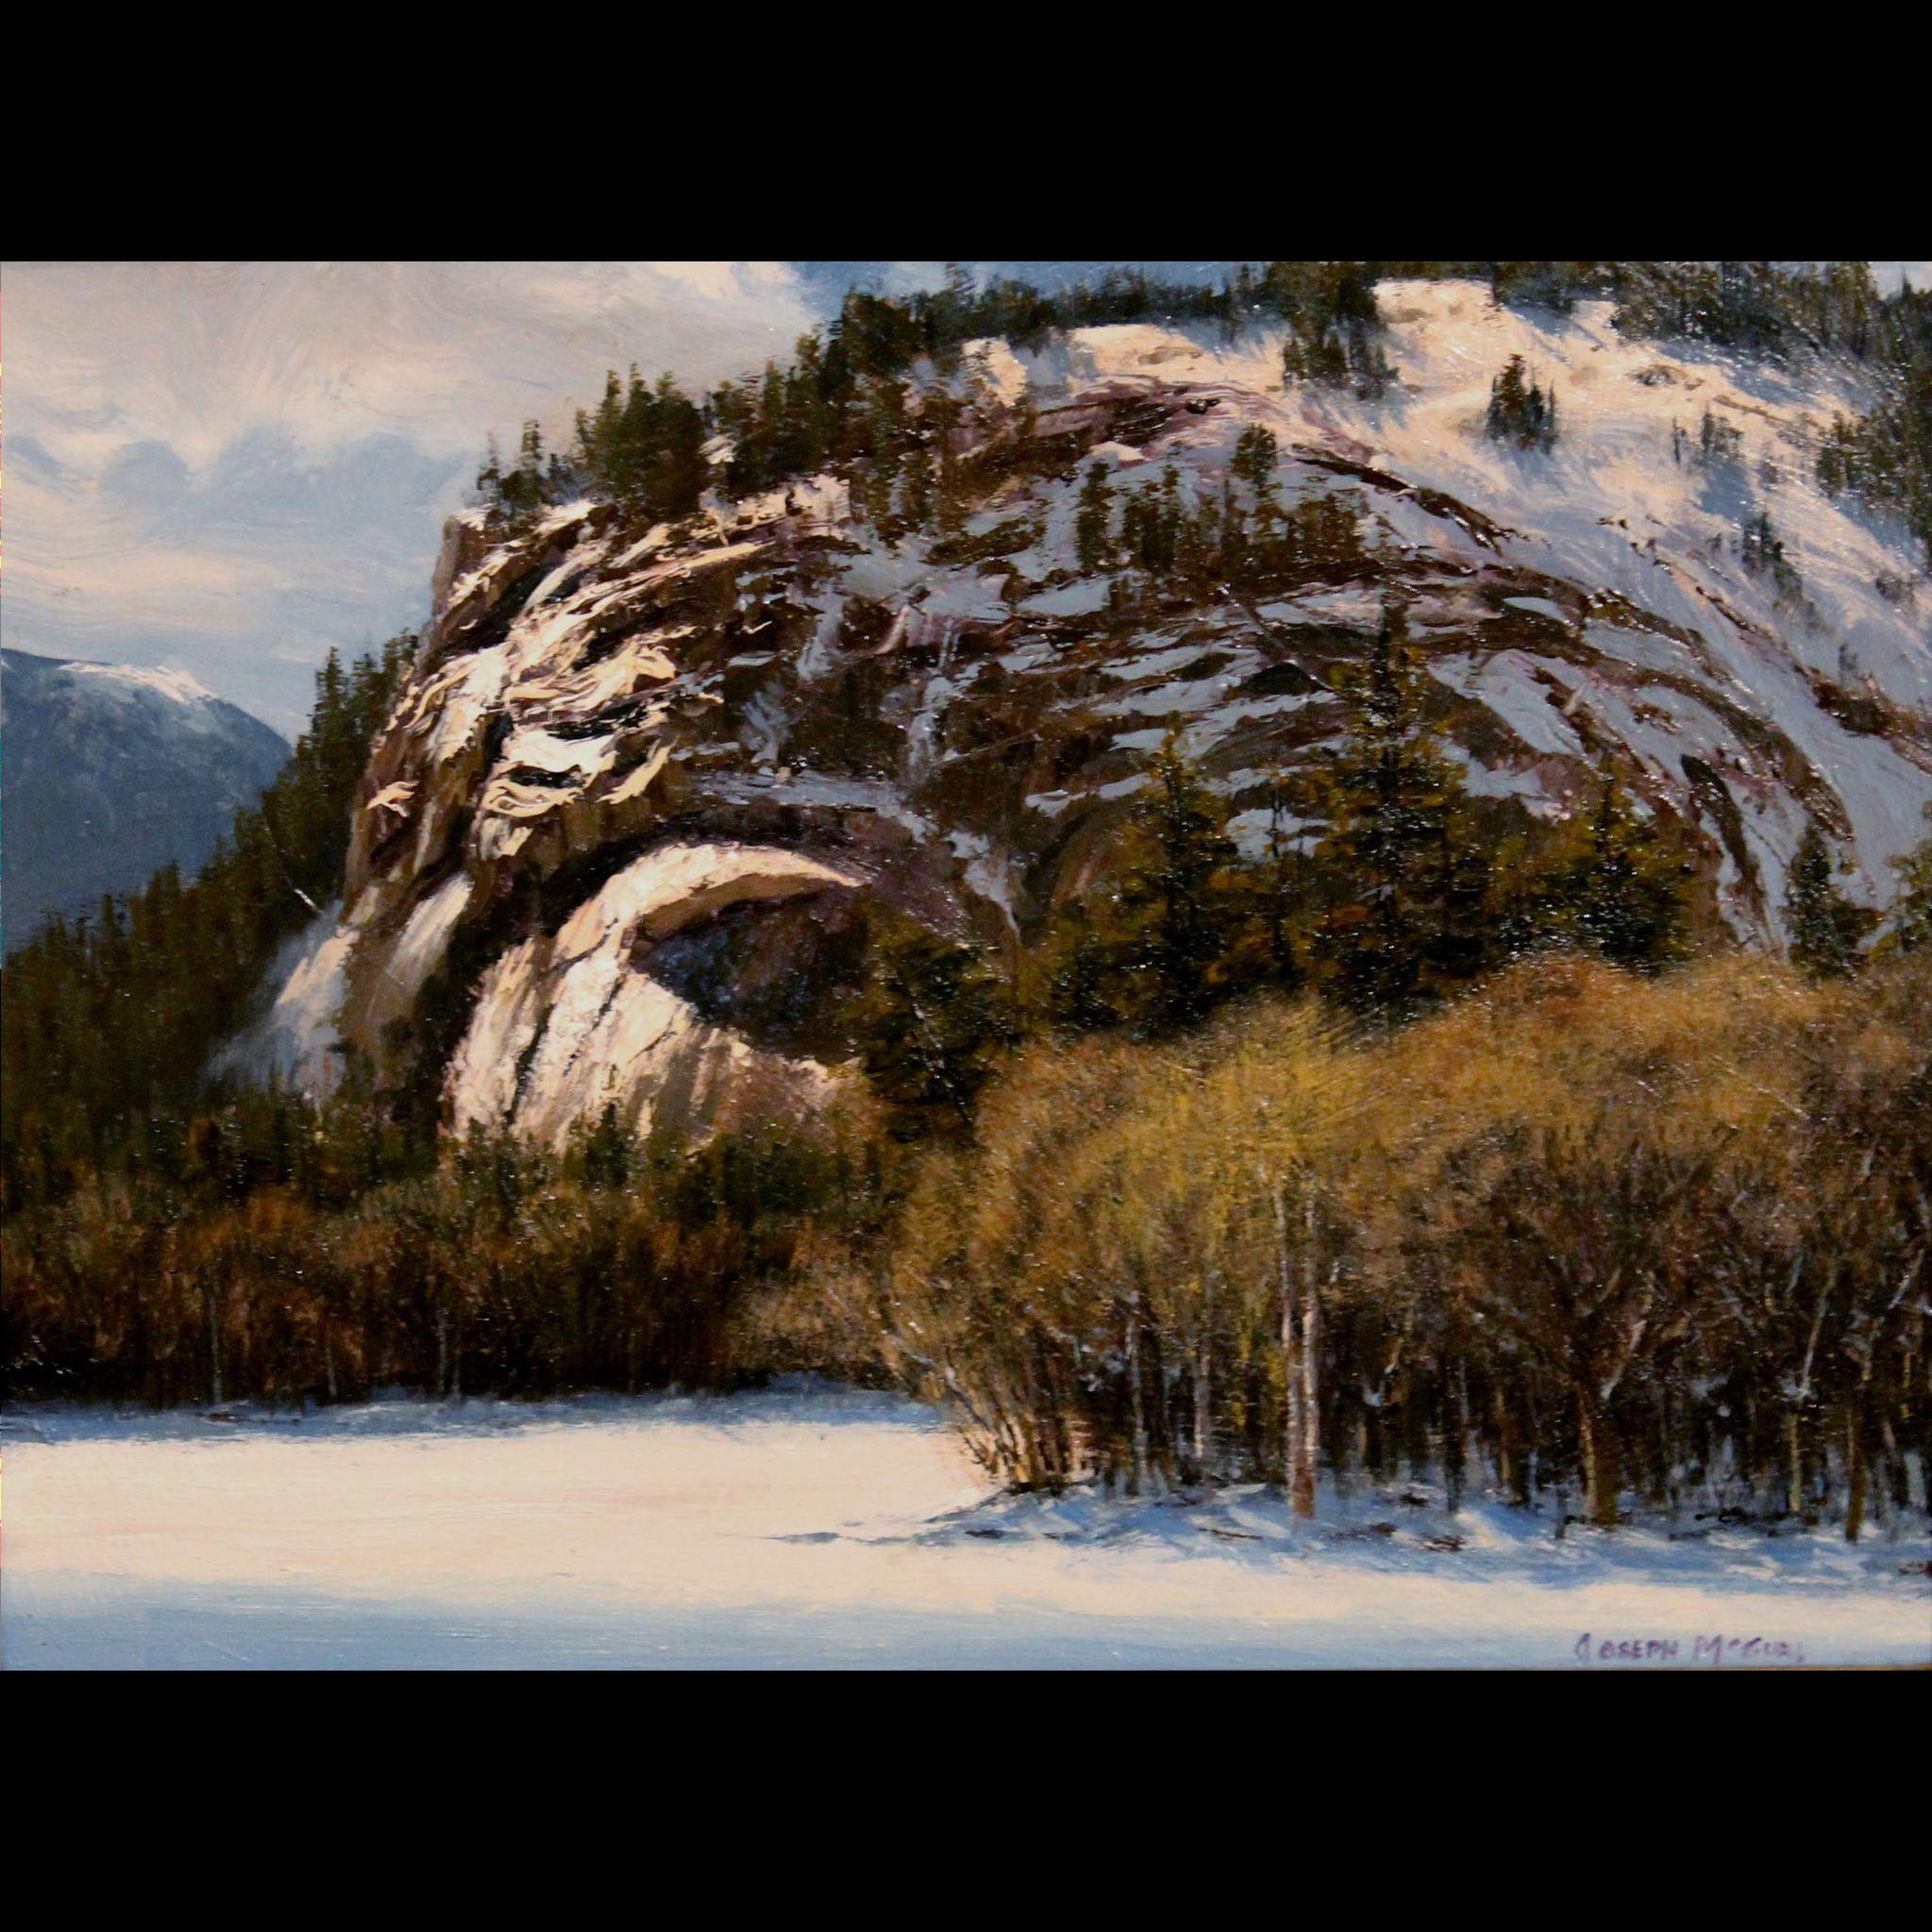 Joseph McGurl White Mountain Oil Painting - Plein Air Sketch for Warm Winter Sun NH